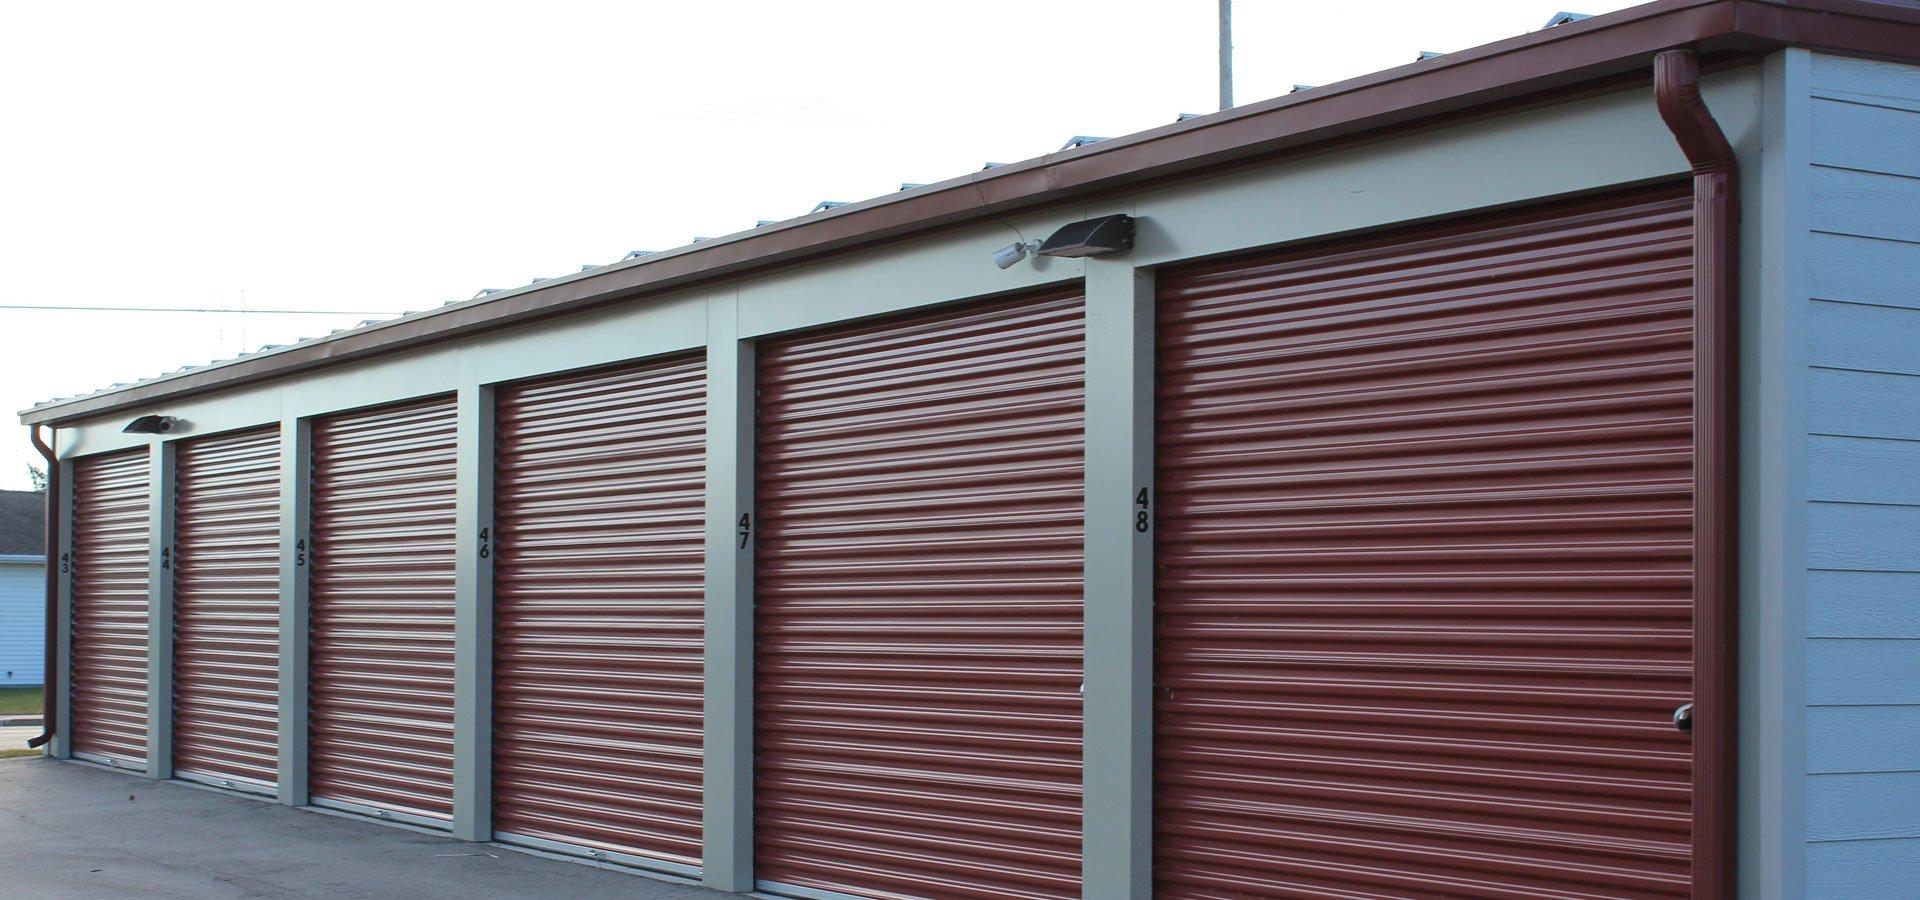 Butler Manufacturing pre-engineered metal buildings storage close up exterior shot of closed garage doors